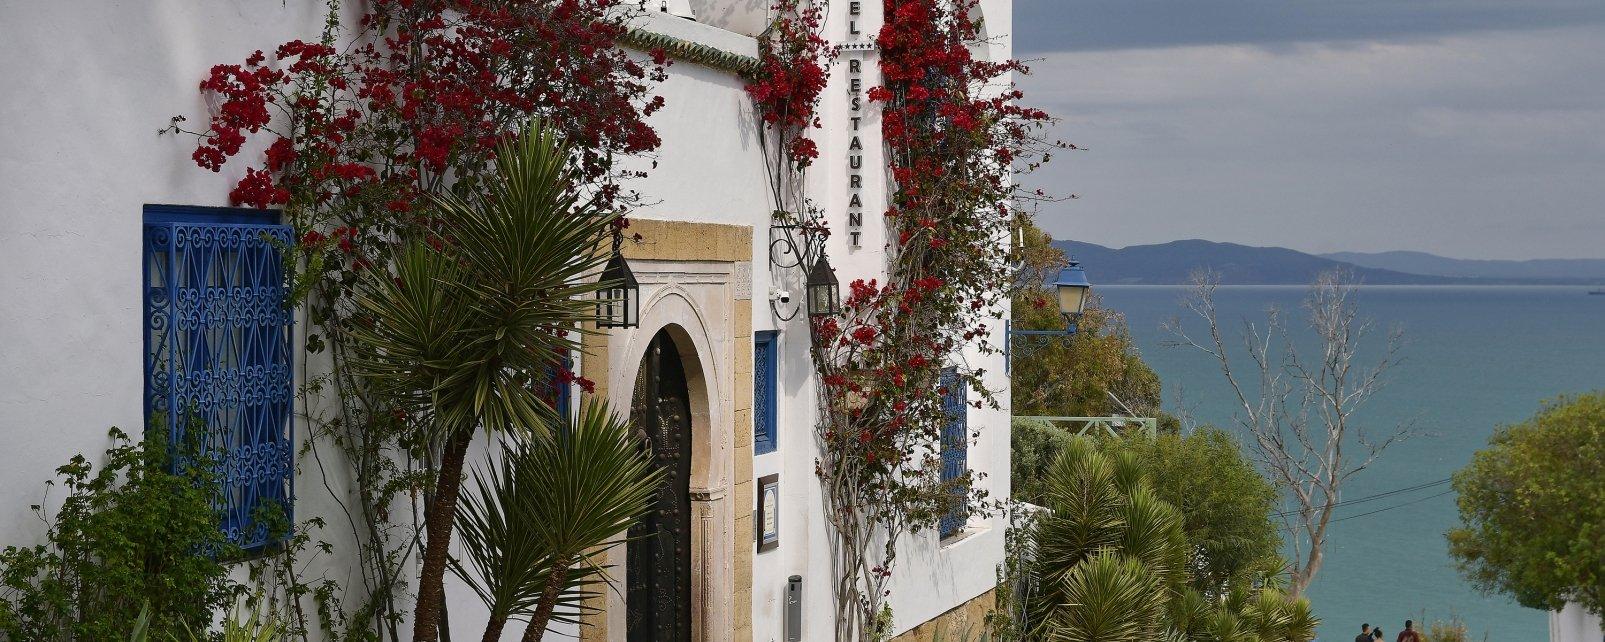 Hôtel La Villa Bleue